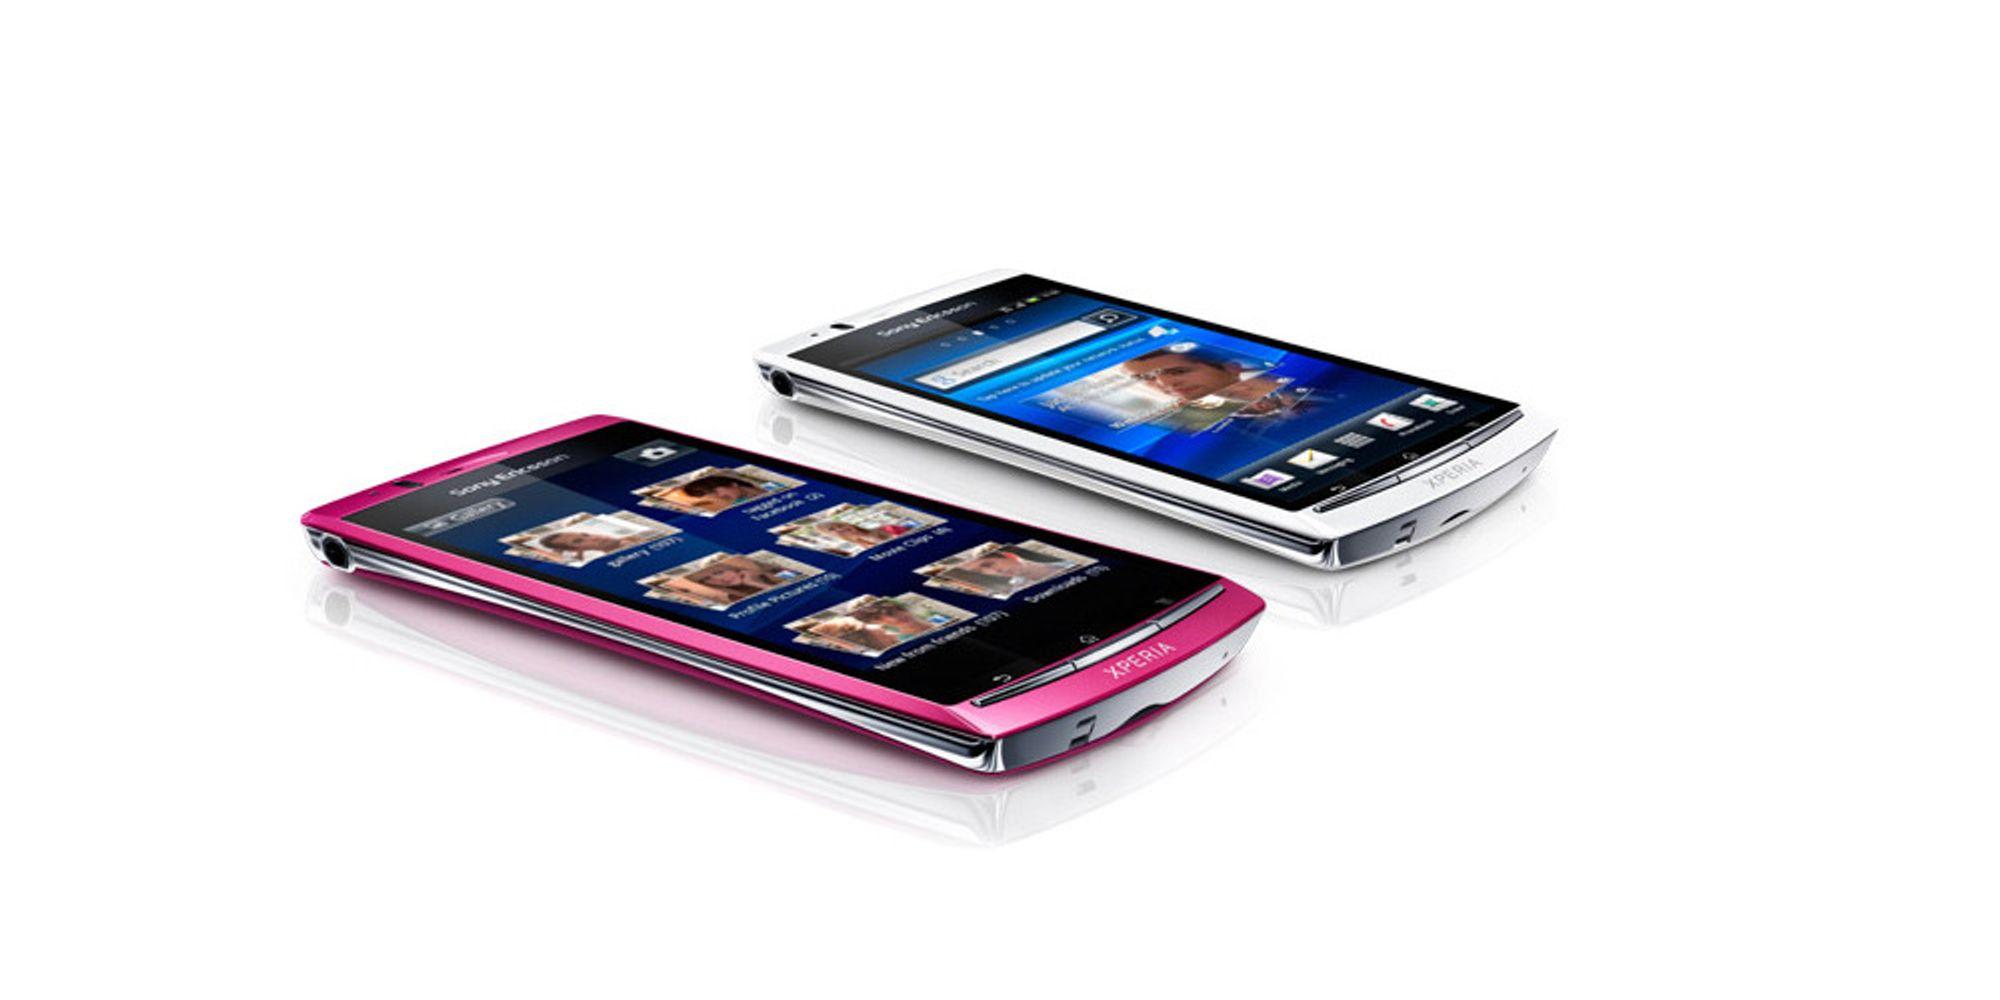 Sony Ericsson lanserer Xperia Arc S